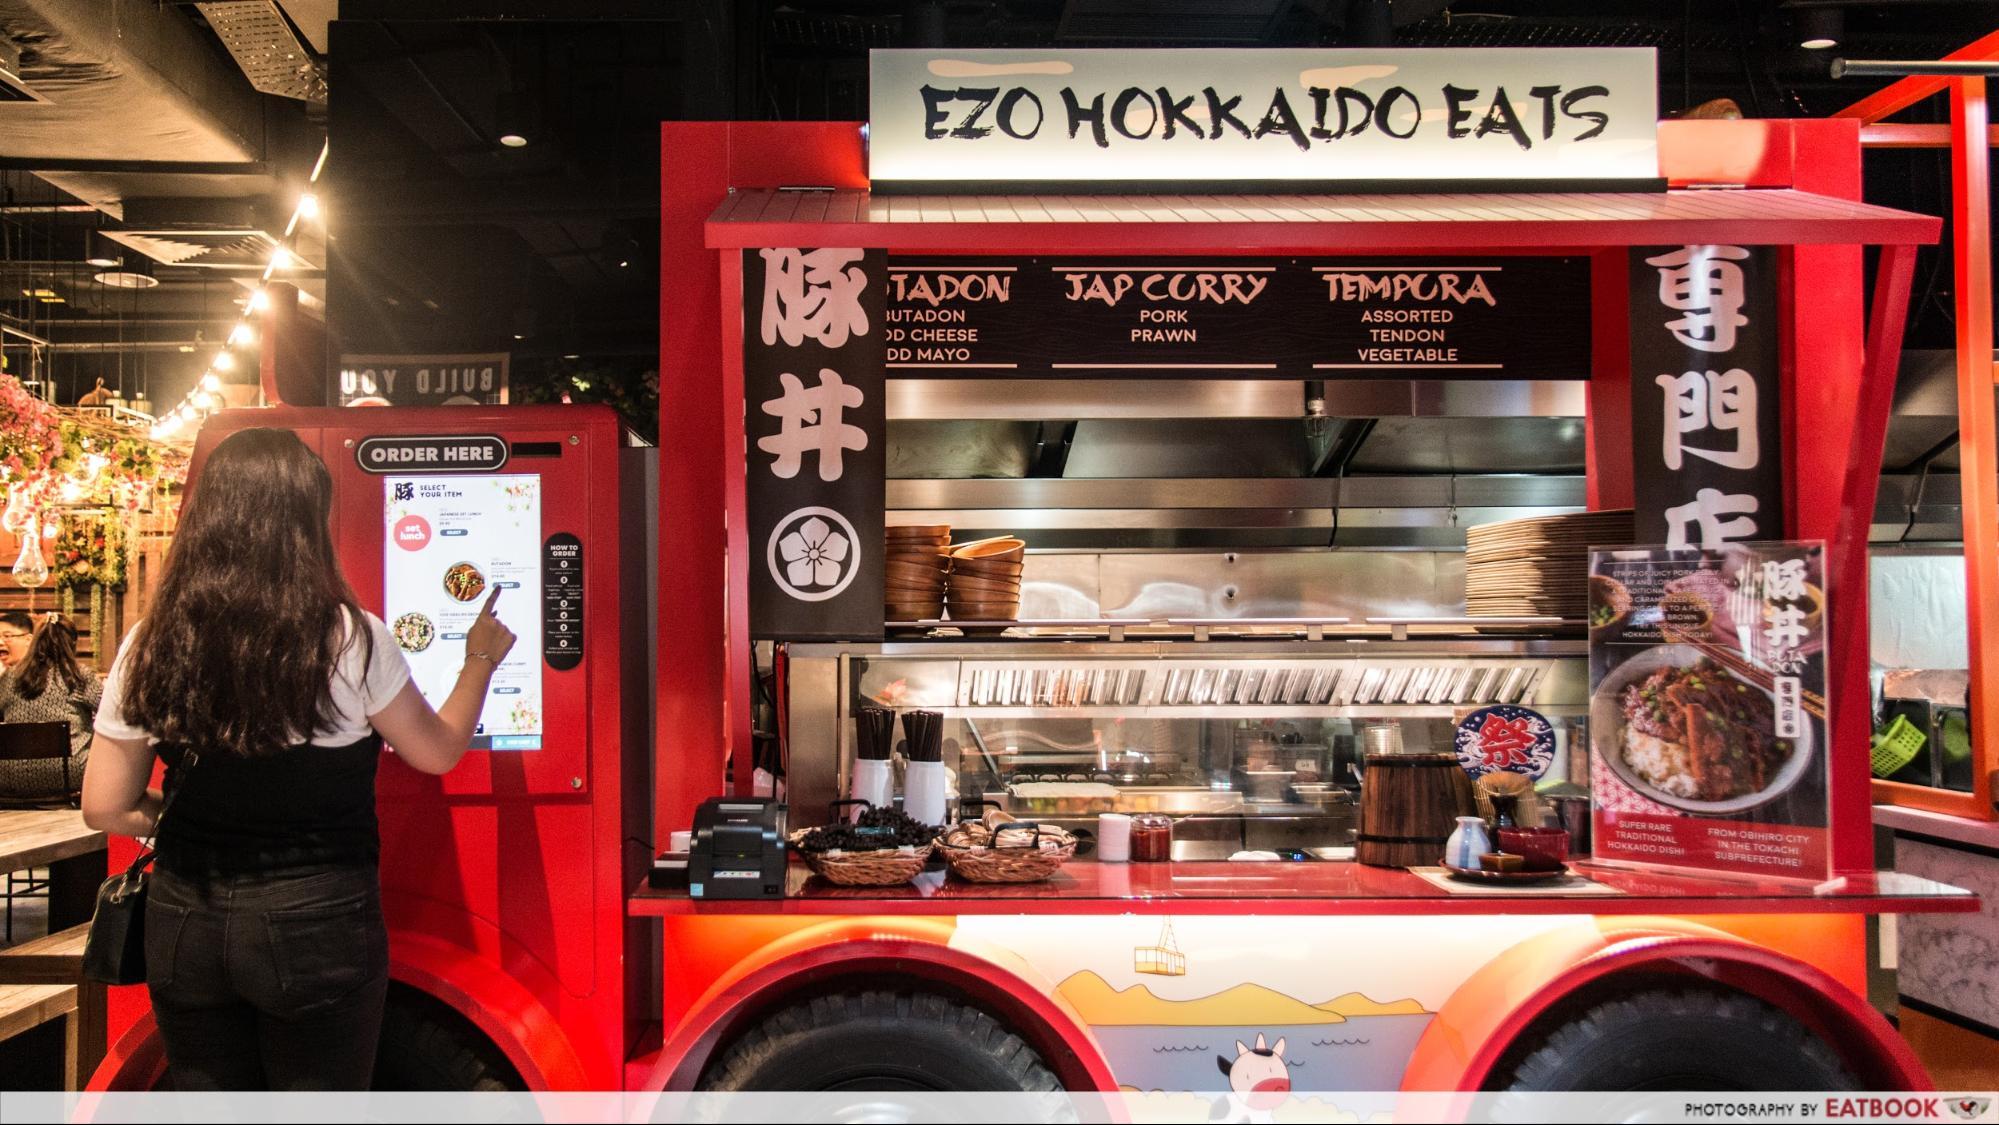 Ezo-Hokkaido Eats - machine